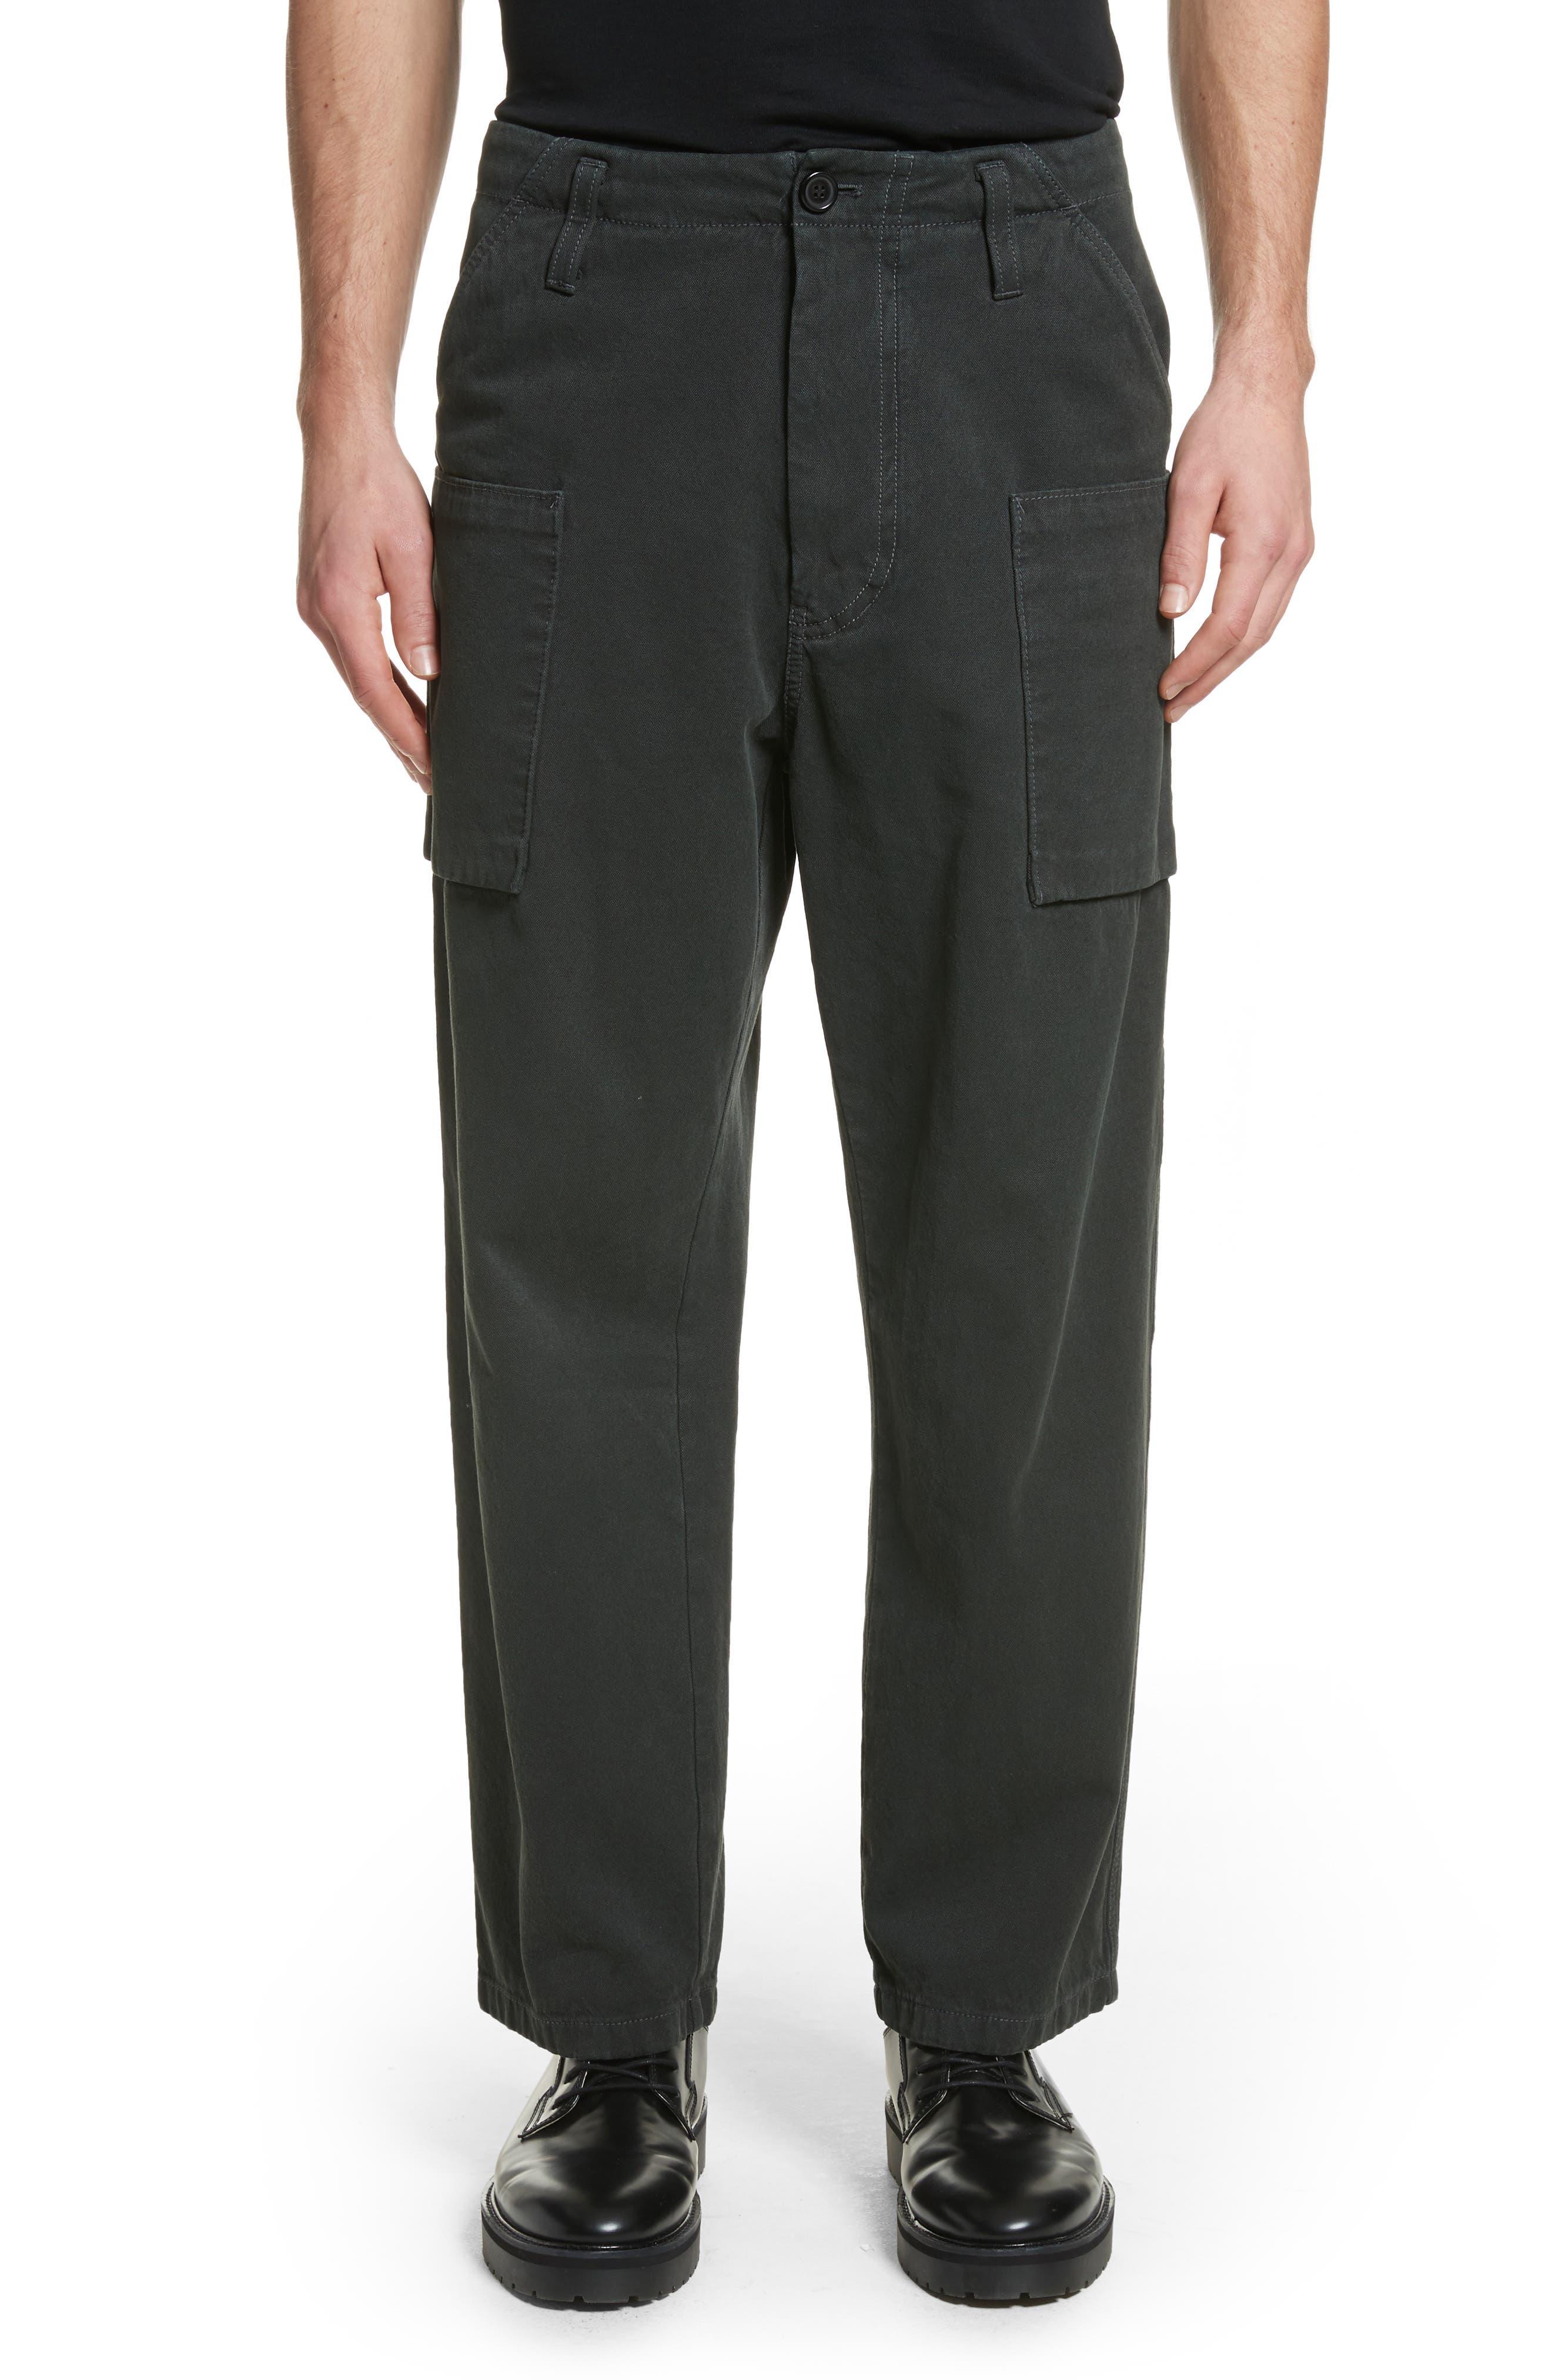 Acne Studios Anselm Wide Leg Patch Cargo Pants